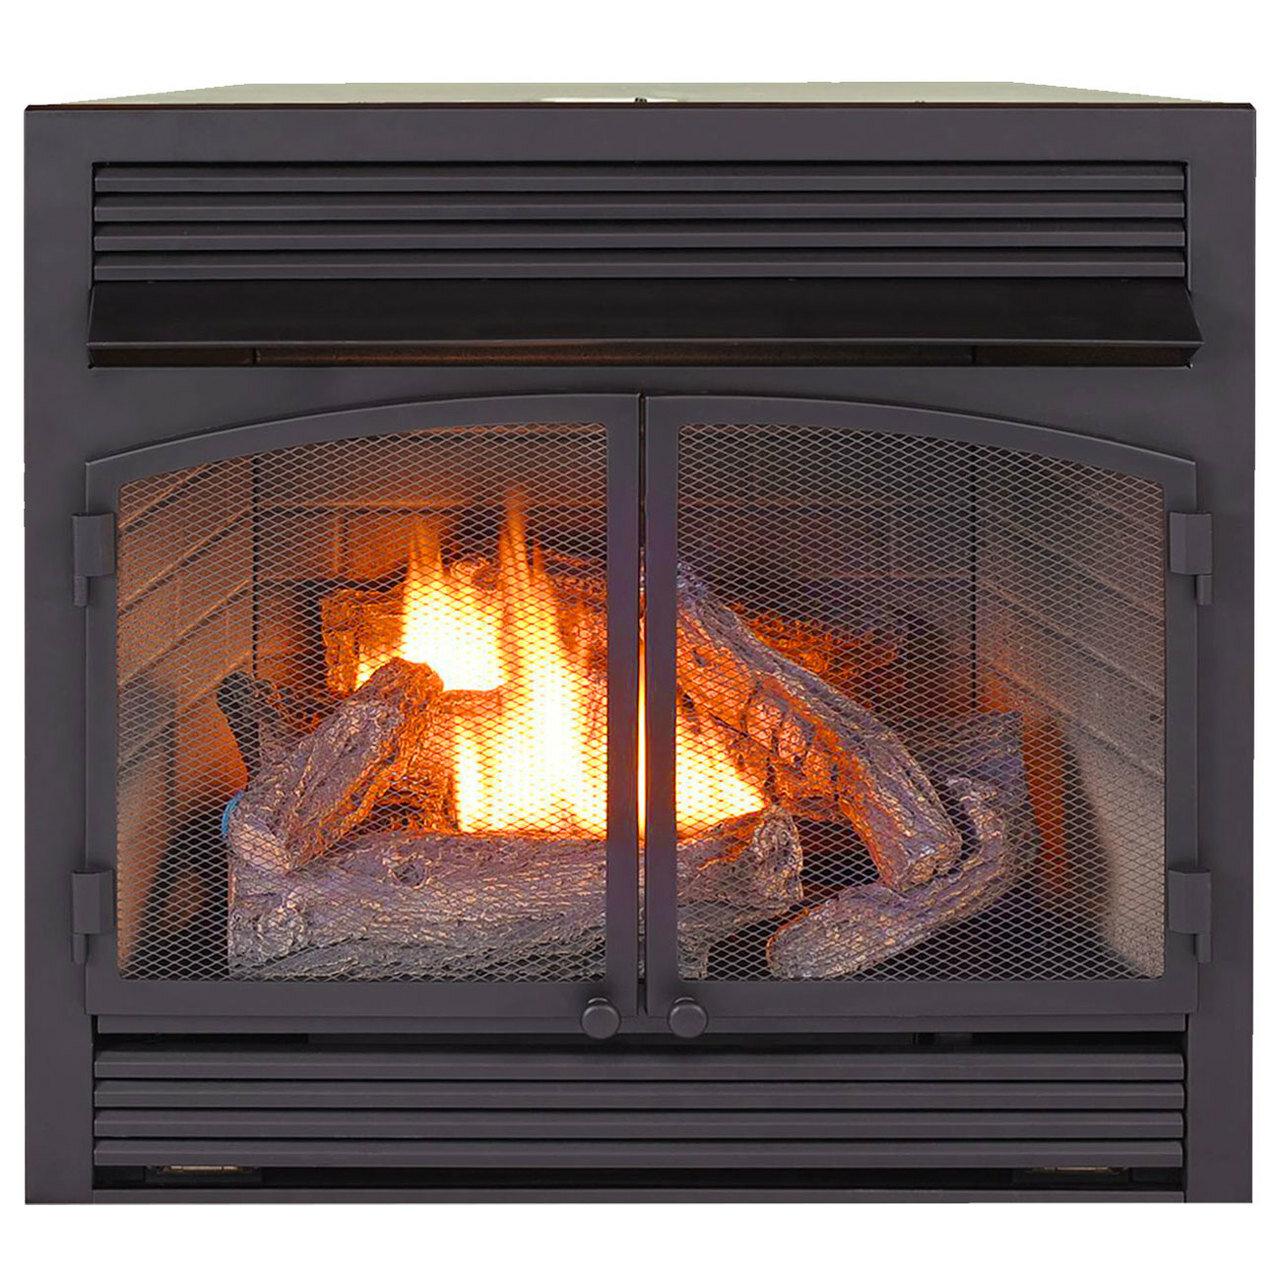 Procom Heating Vent Free Propane Natural Gas Fireplace Insert